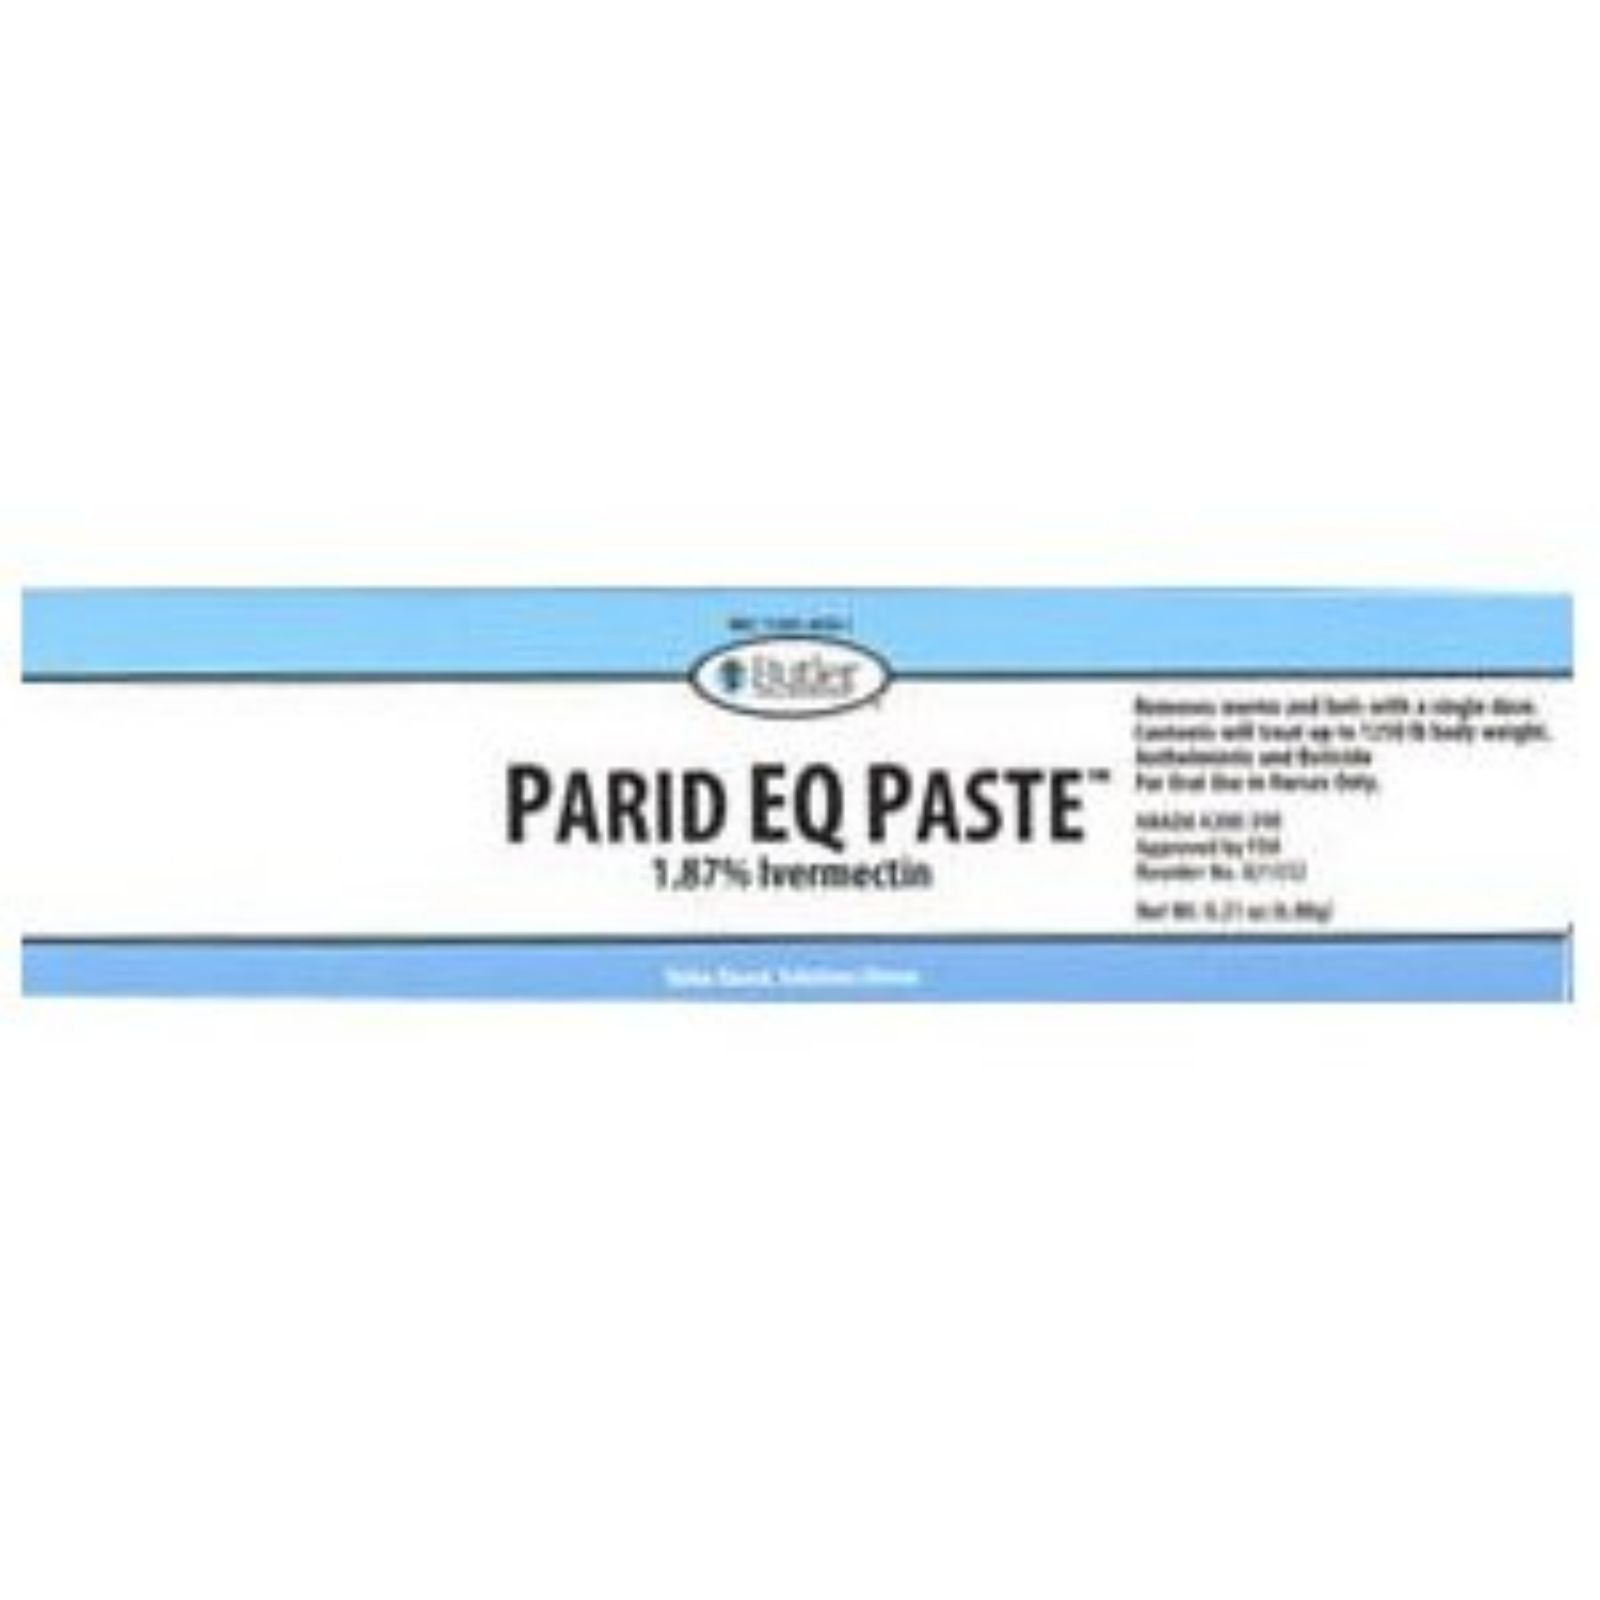 Parid EQ (1.87% Ivermectin) Paste